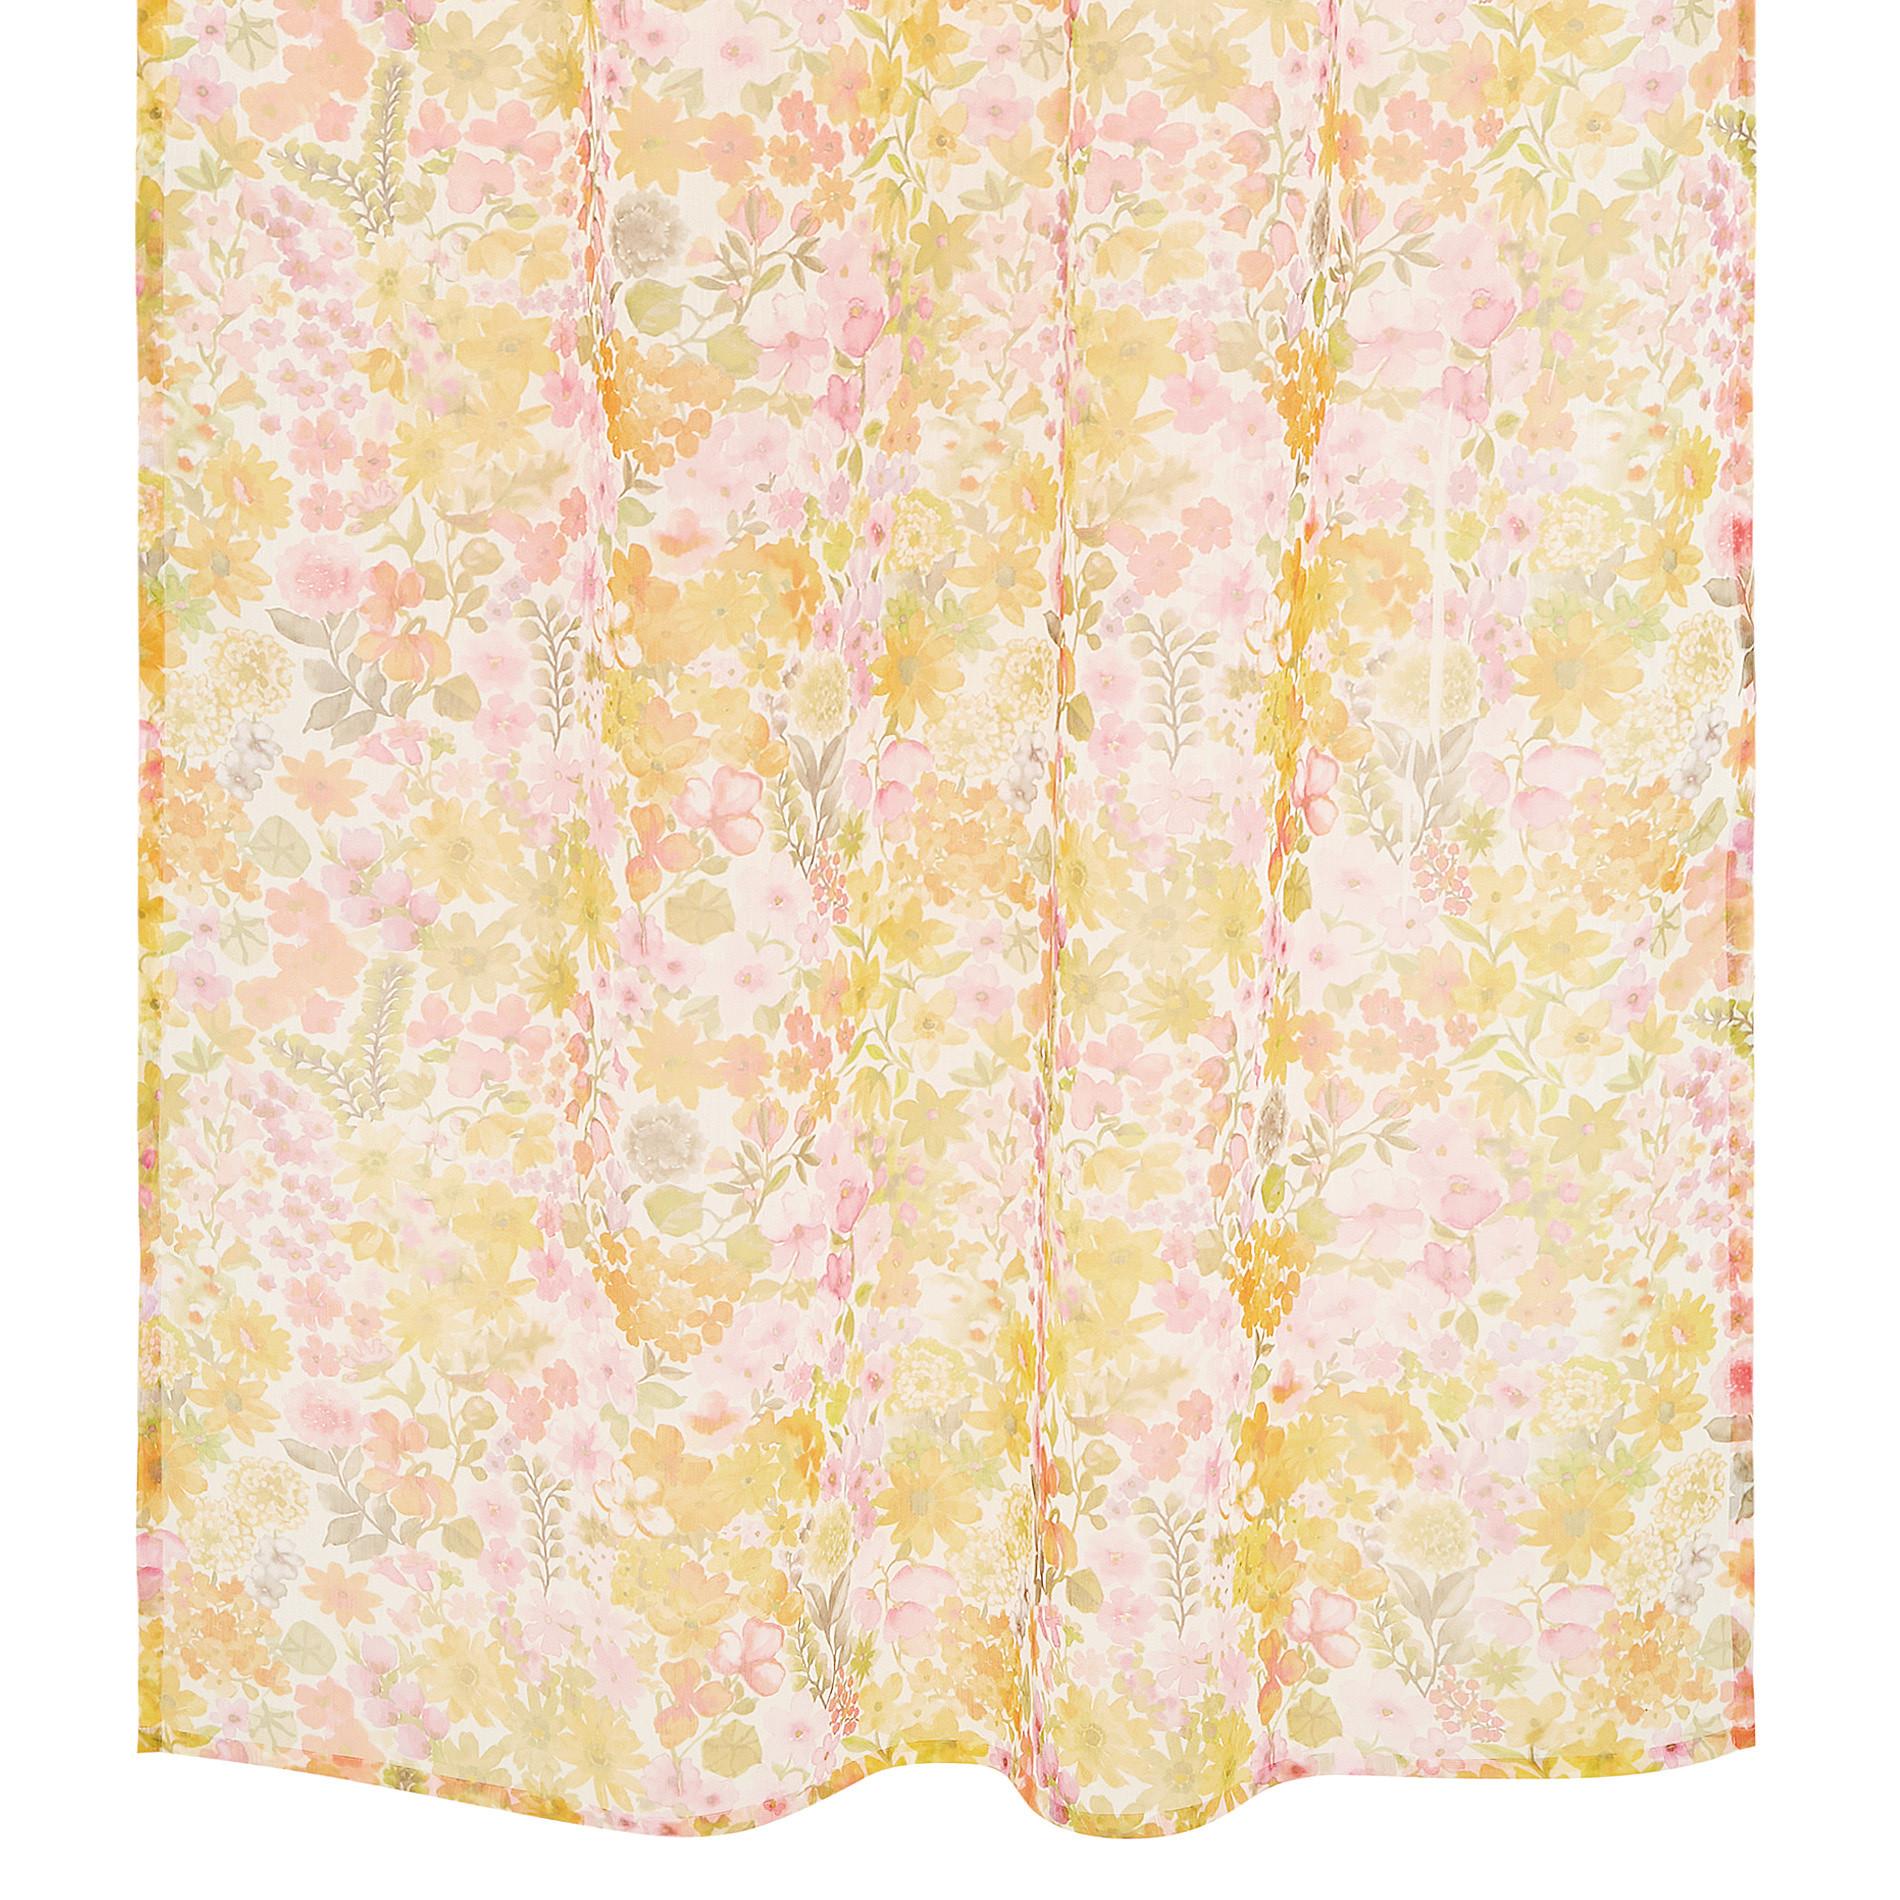 Tenda stampa floreale passanti nascosti, Multicolor, large image number 0